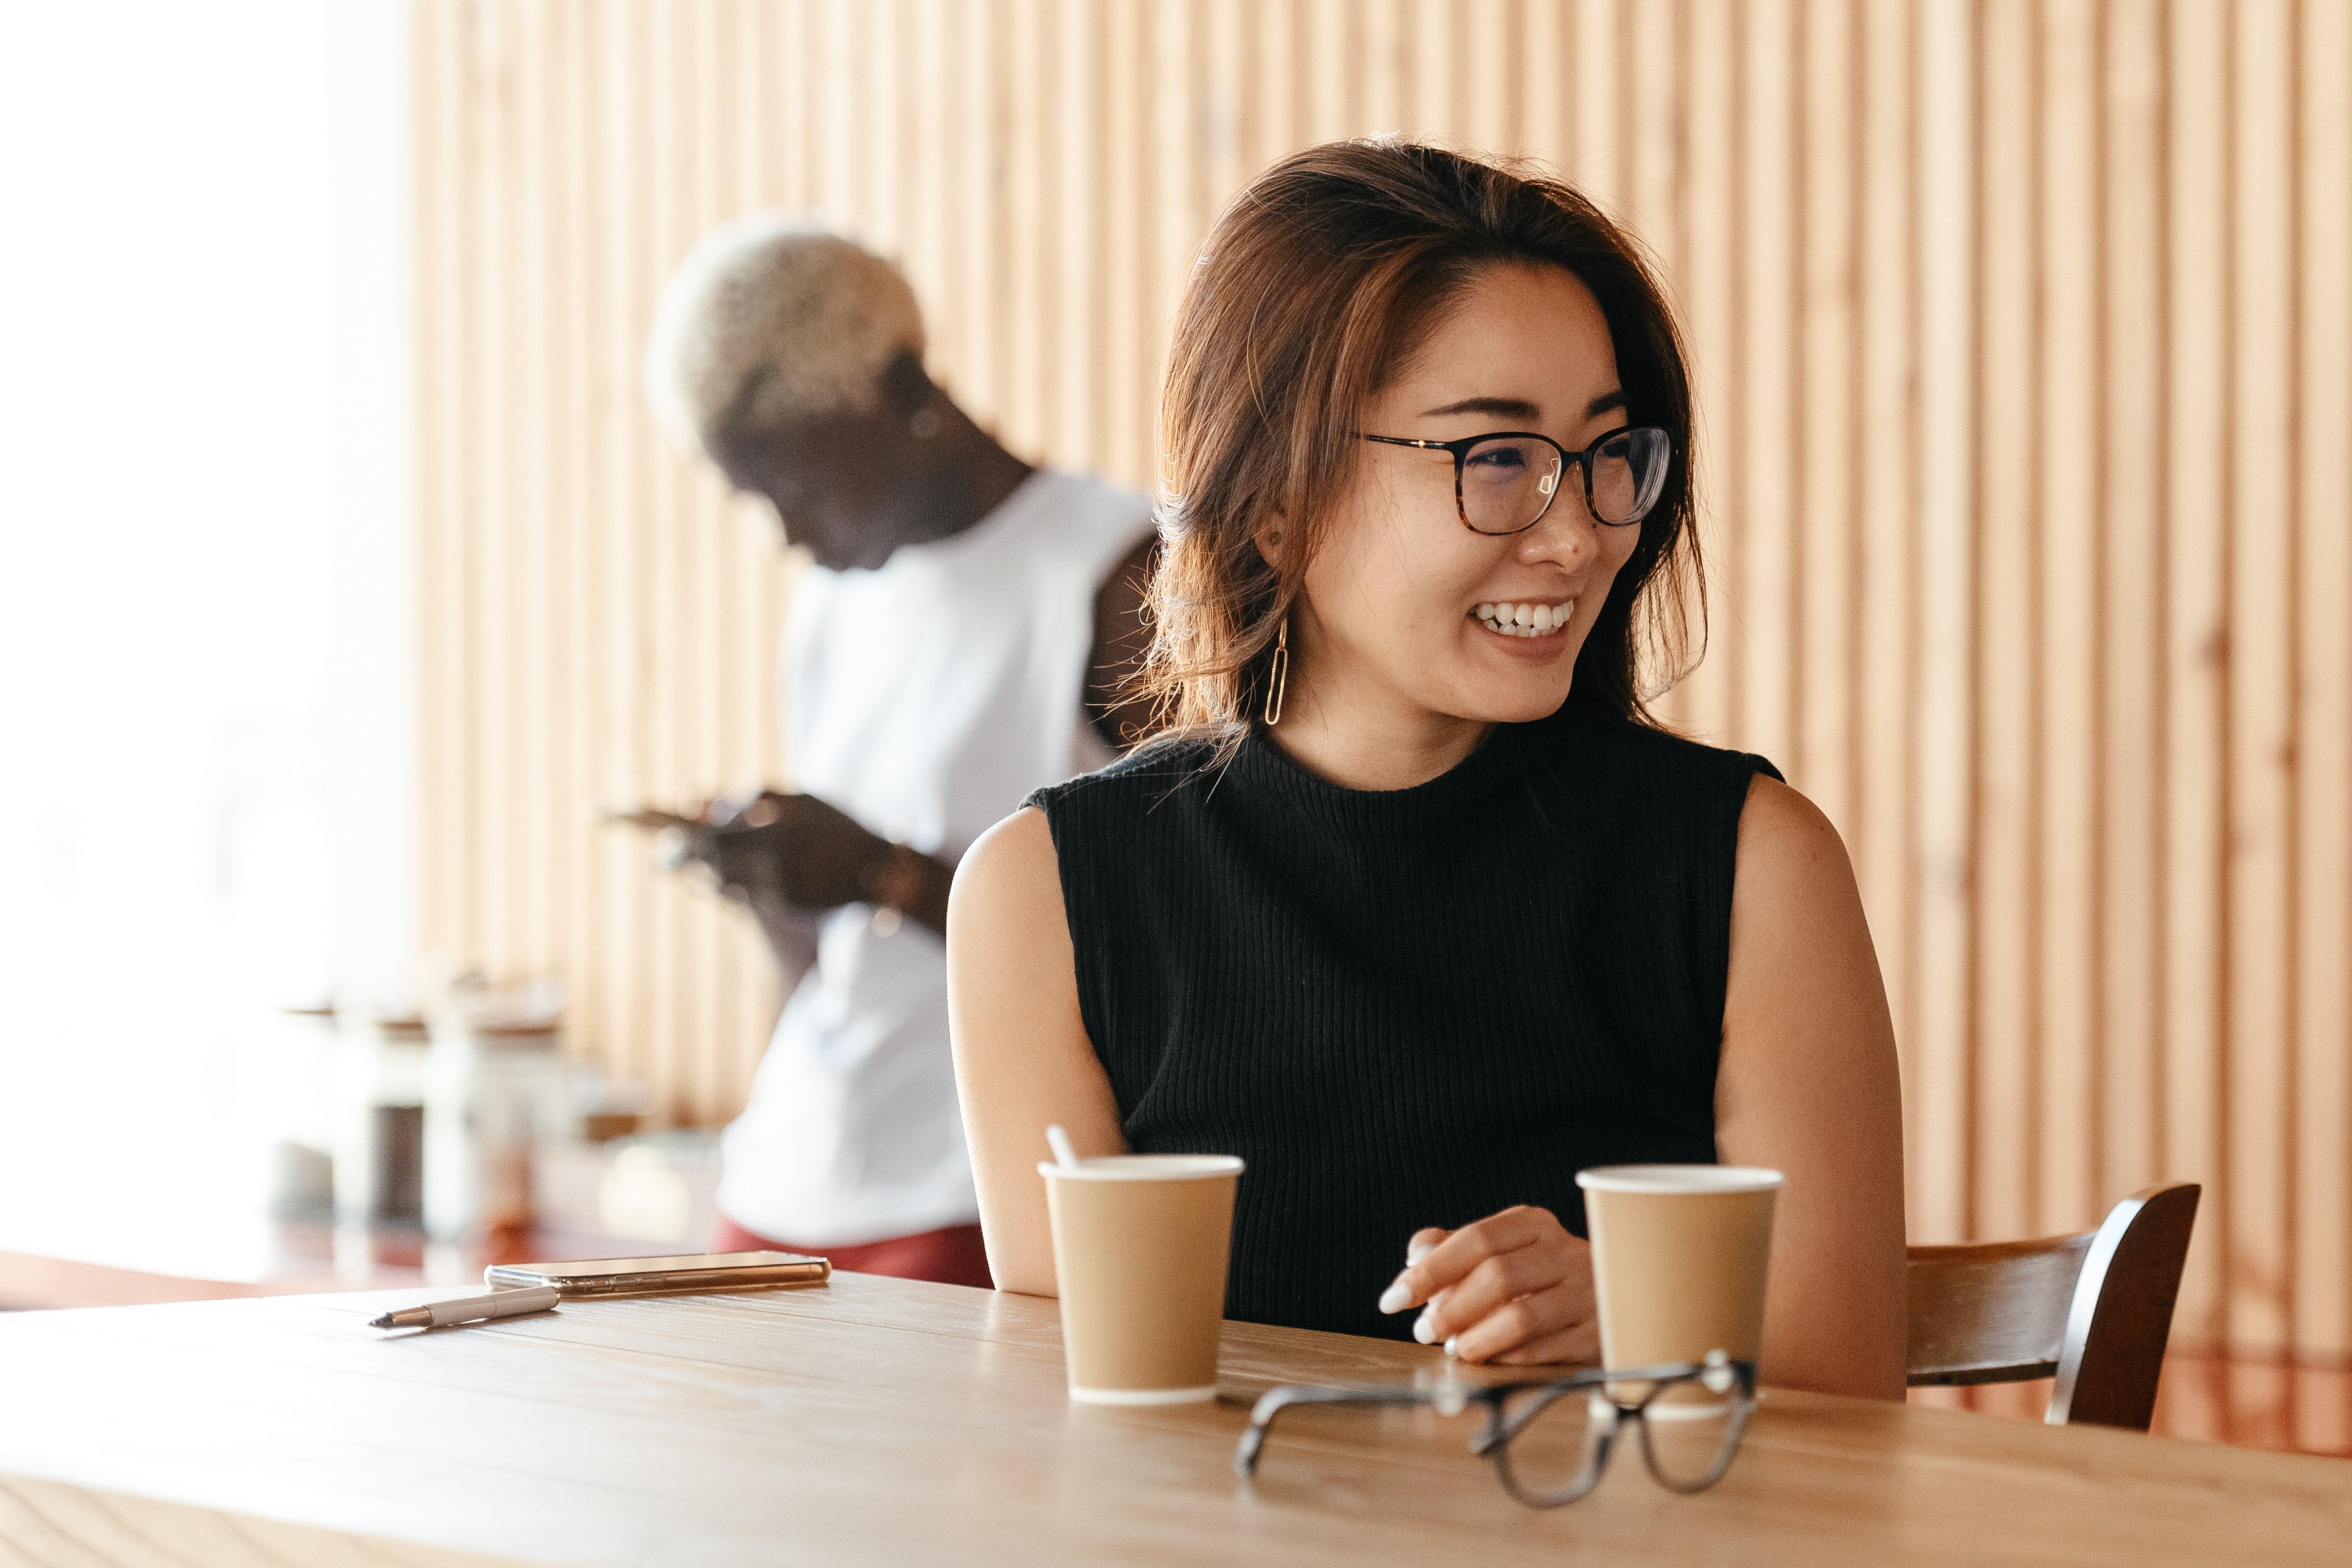 Workplace Trend Alert: 4-Day Work Weeks